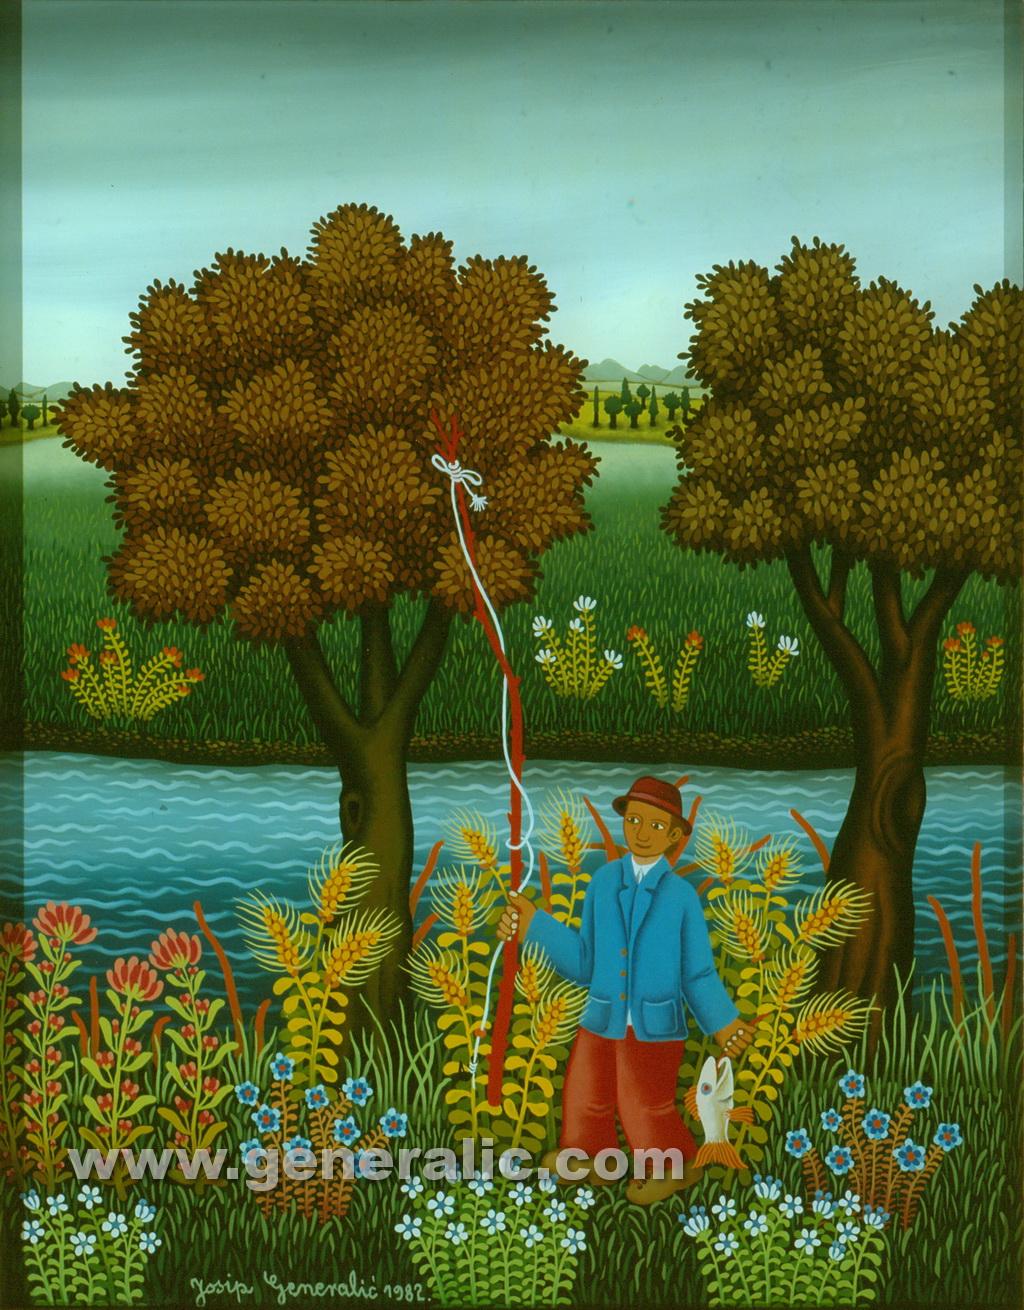 Josip Generalic, 1982, Fisherman, oil on glass, 45x35 cm